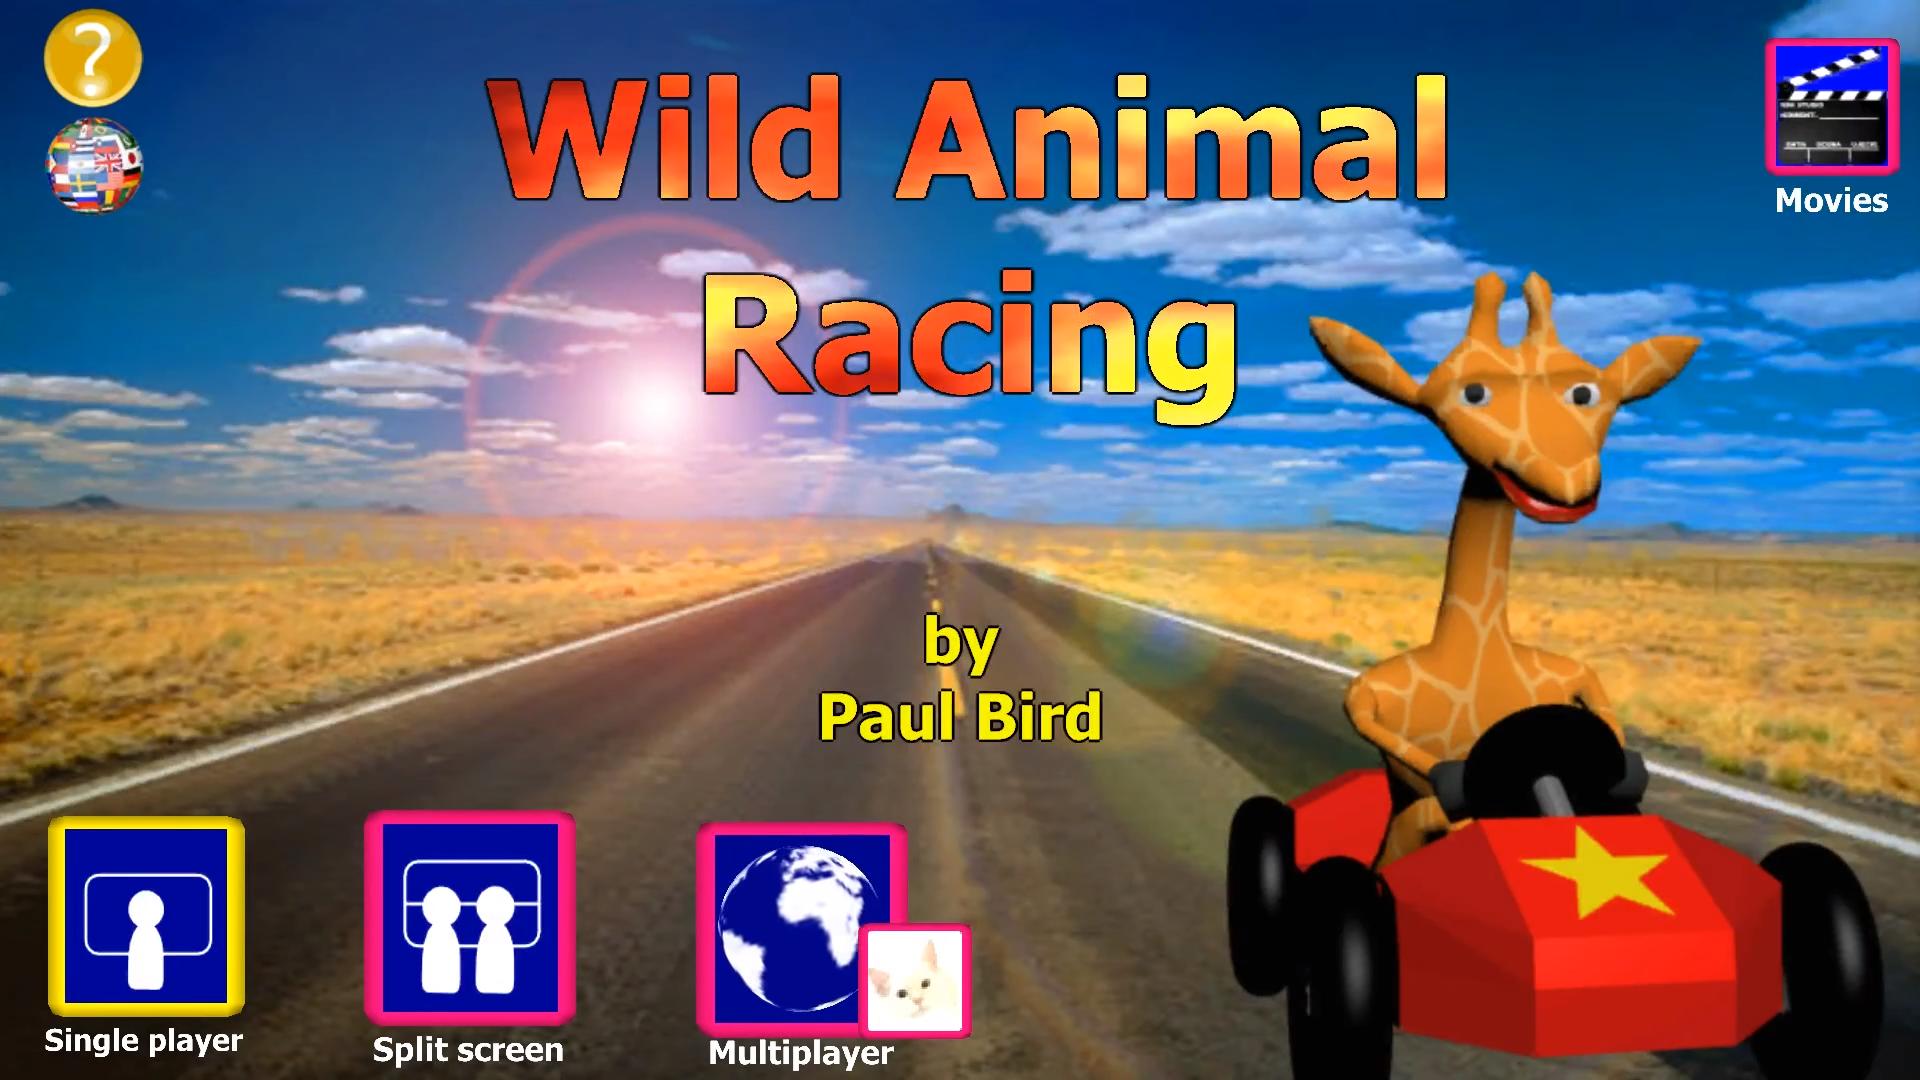 Meme Games | NLSS Wiki | FANDOM powered by Wikia